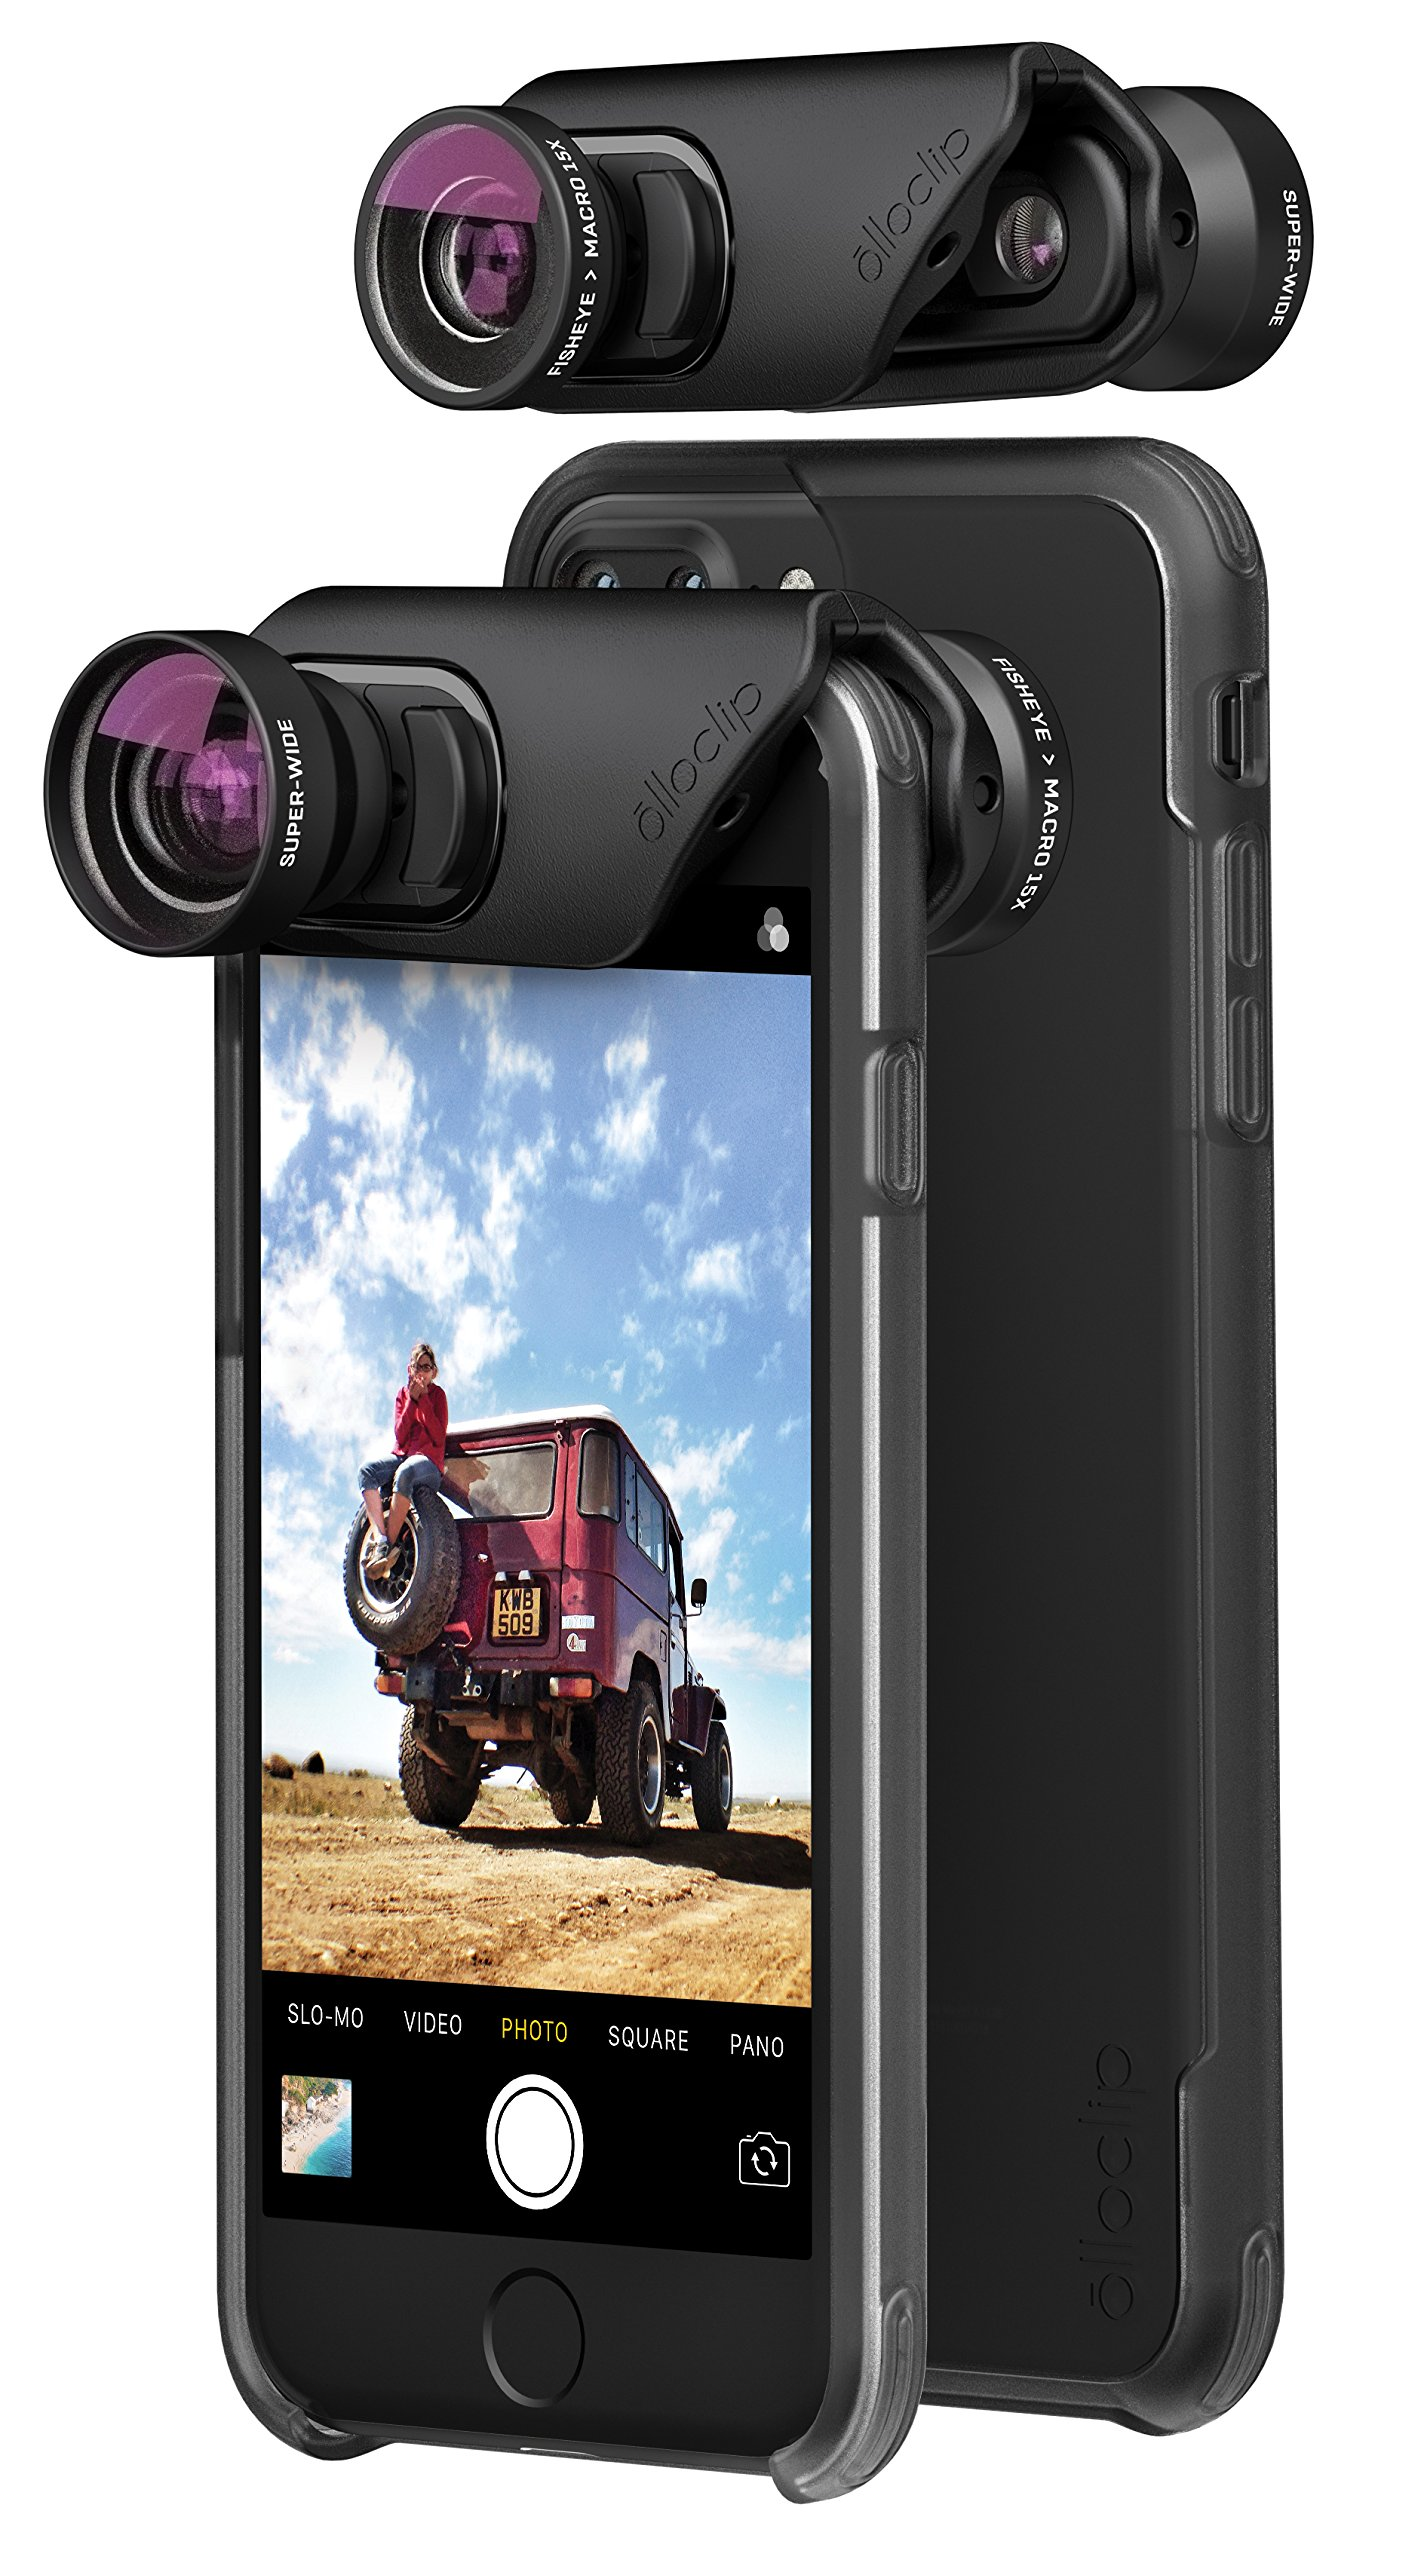 olloclip — CORE LENS SET + OLLO CASE Combo - Compatible with iPhone 8/7 & iPhone 8/7 Plus — Includes 2 iPhone cases + SUPER-WIDE, FISHEYE & MACRO Premium Glass Lenses — Lens: Black/Black, Cases: Clear